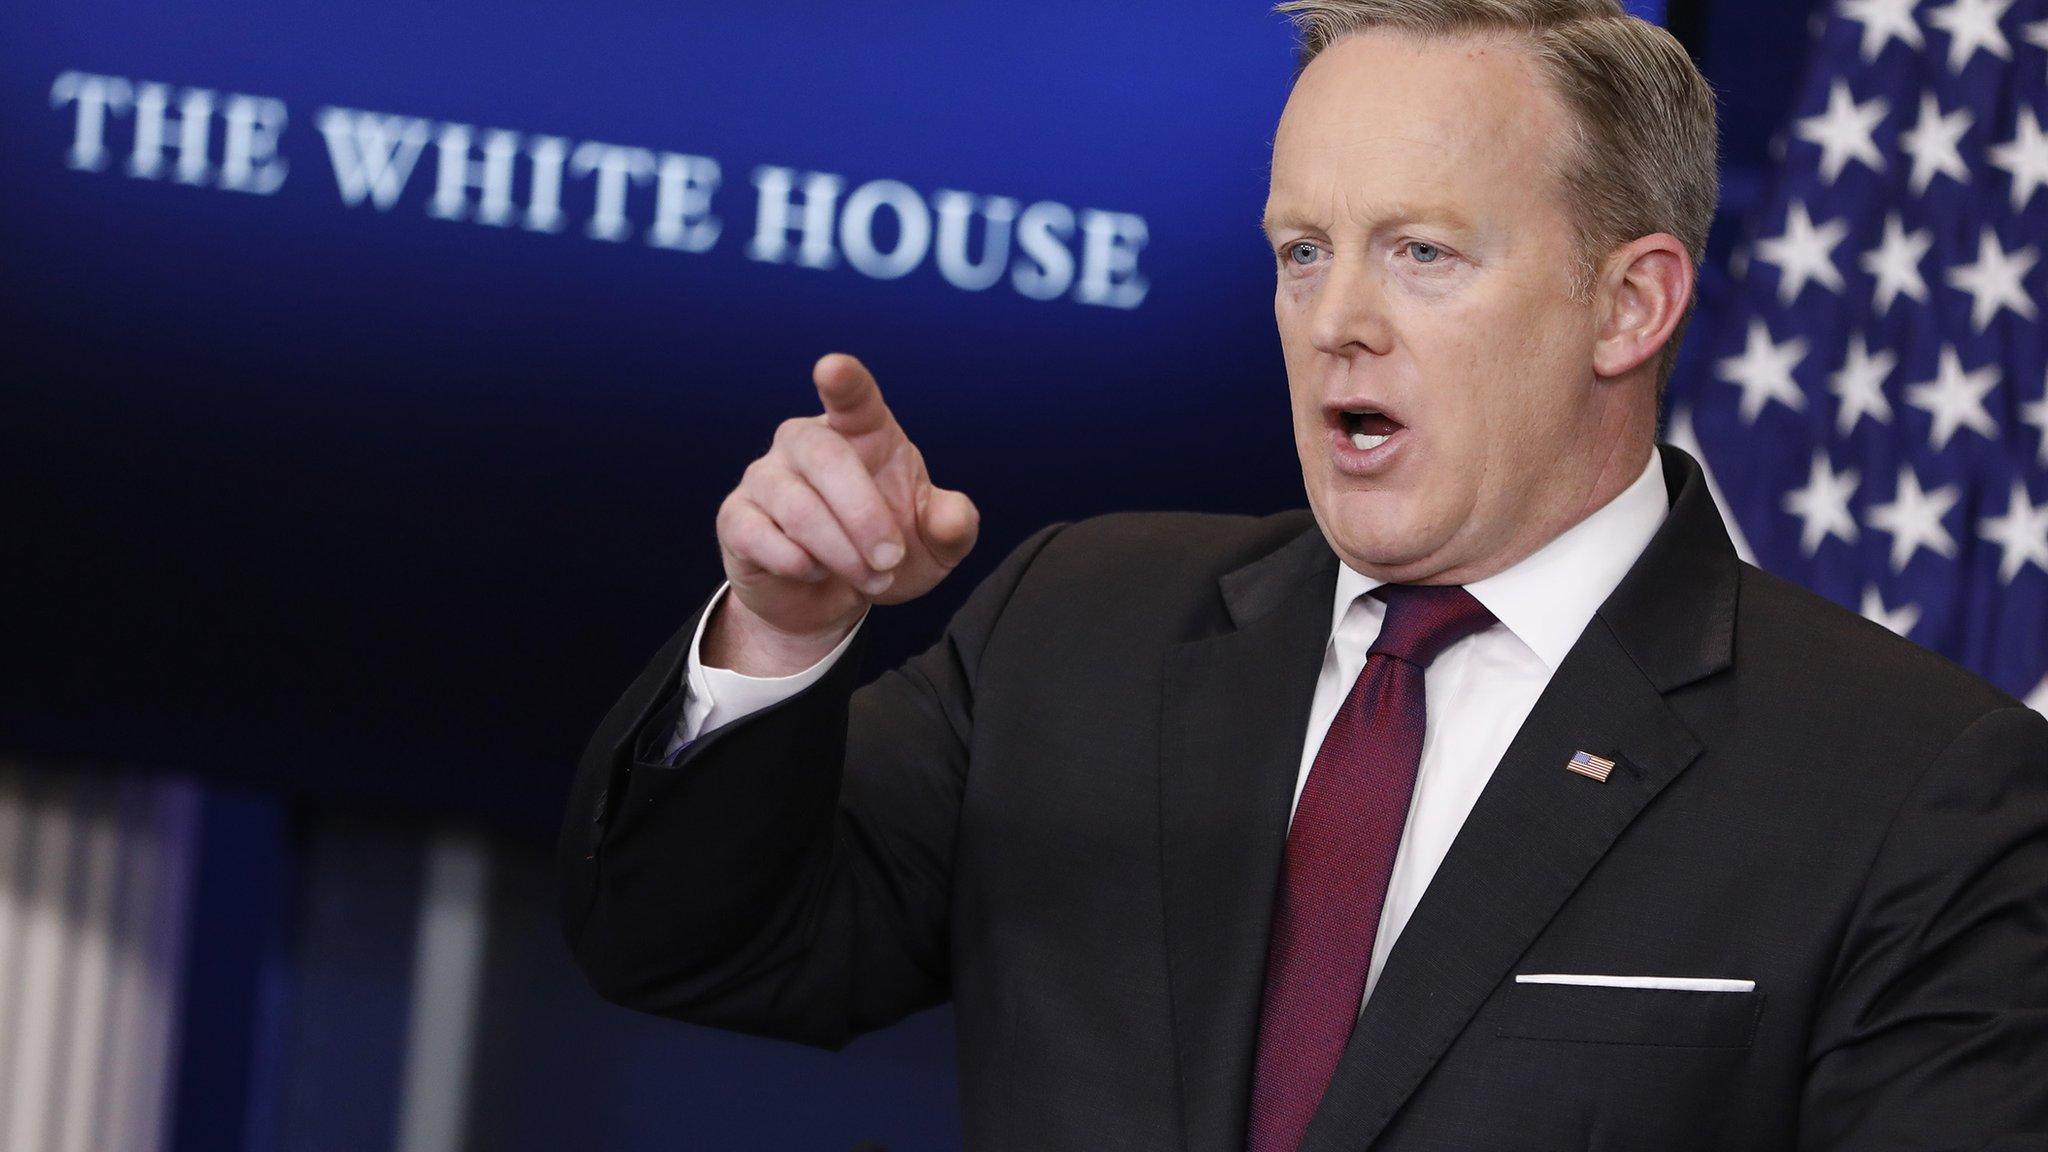 Sean Spicer quits: White House press secretary plays down 'row'